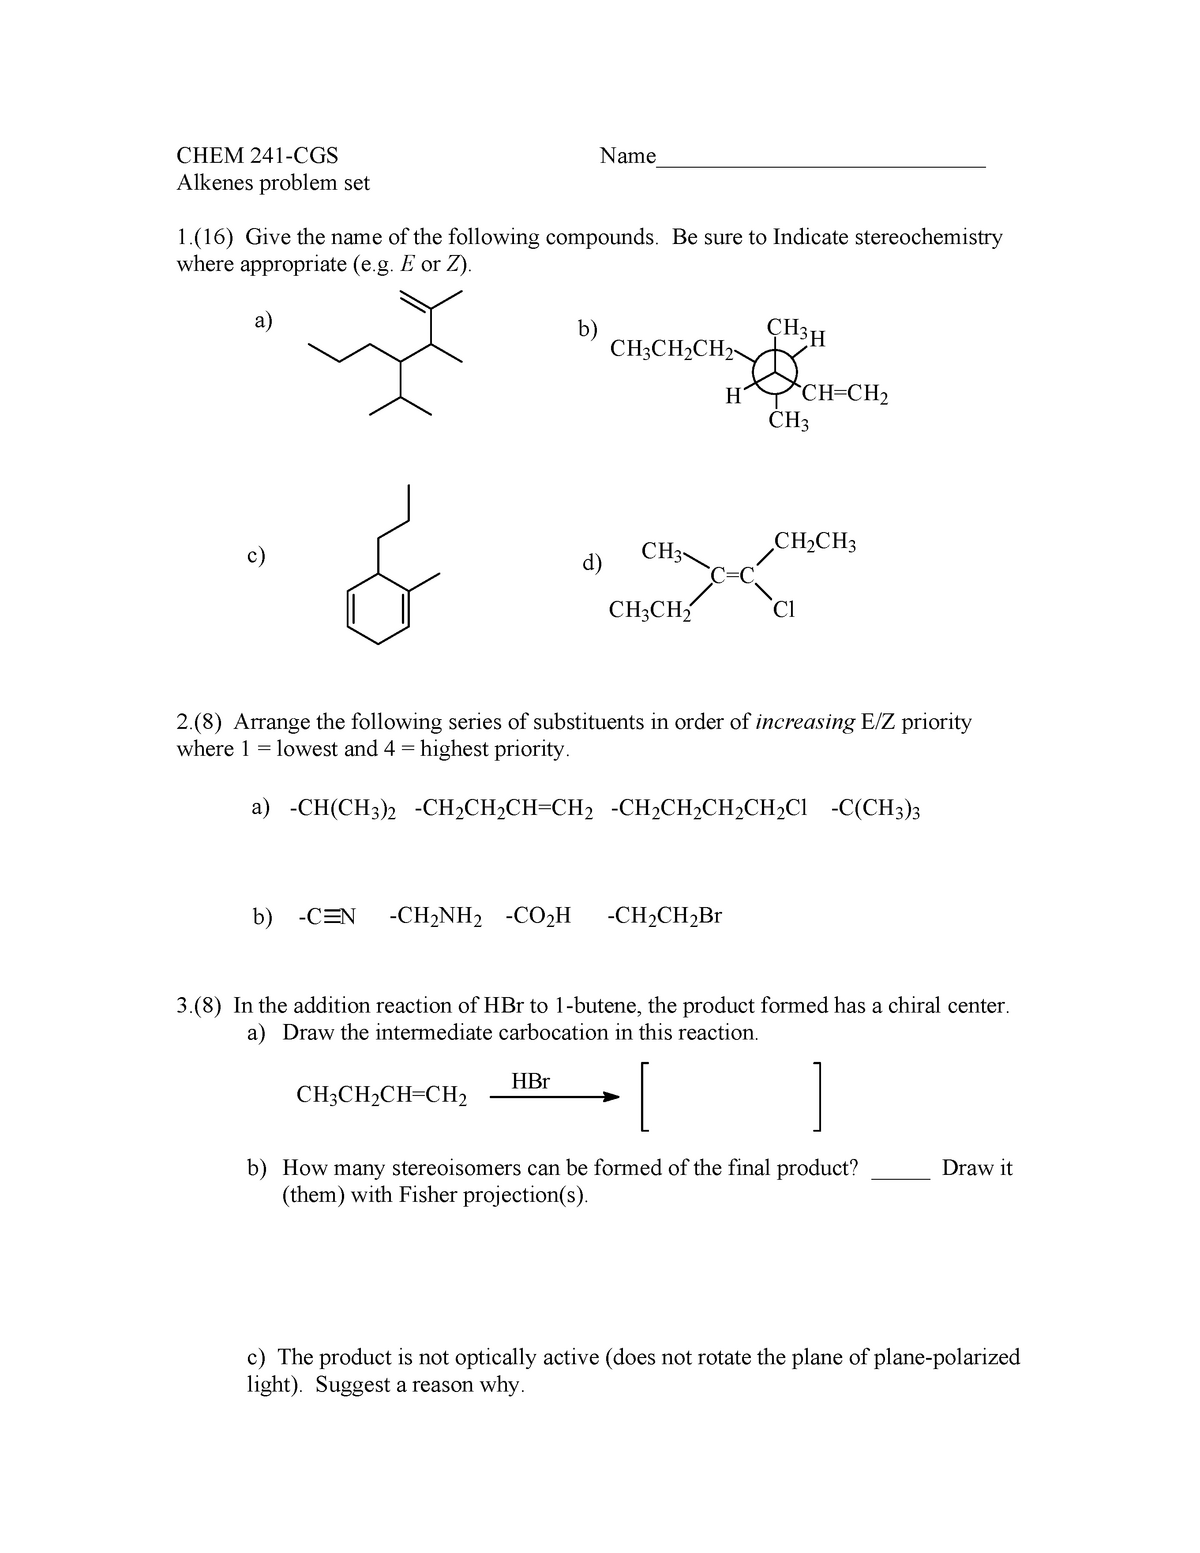 Seminar assignments - Alkenes problem set quiz with answers - CHEM